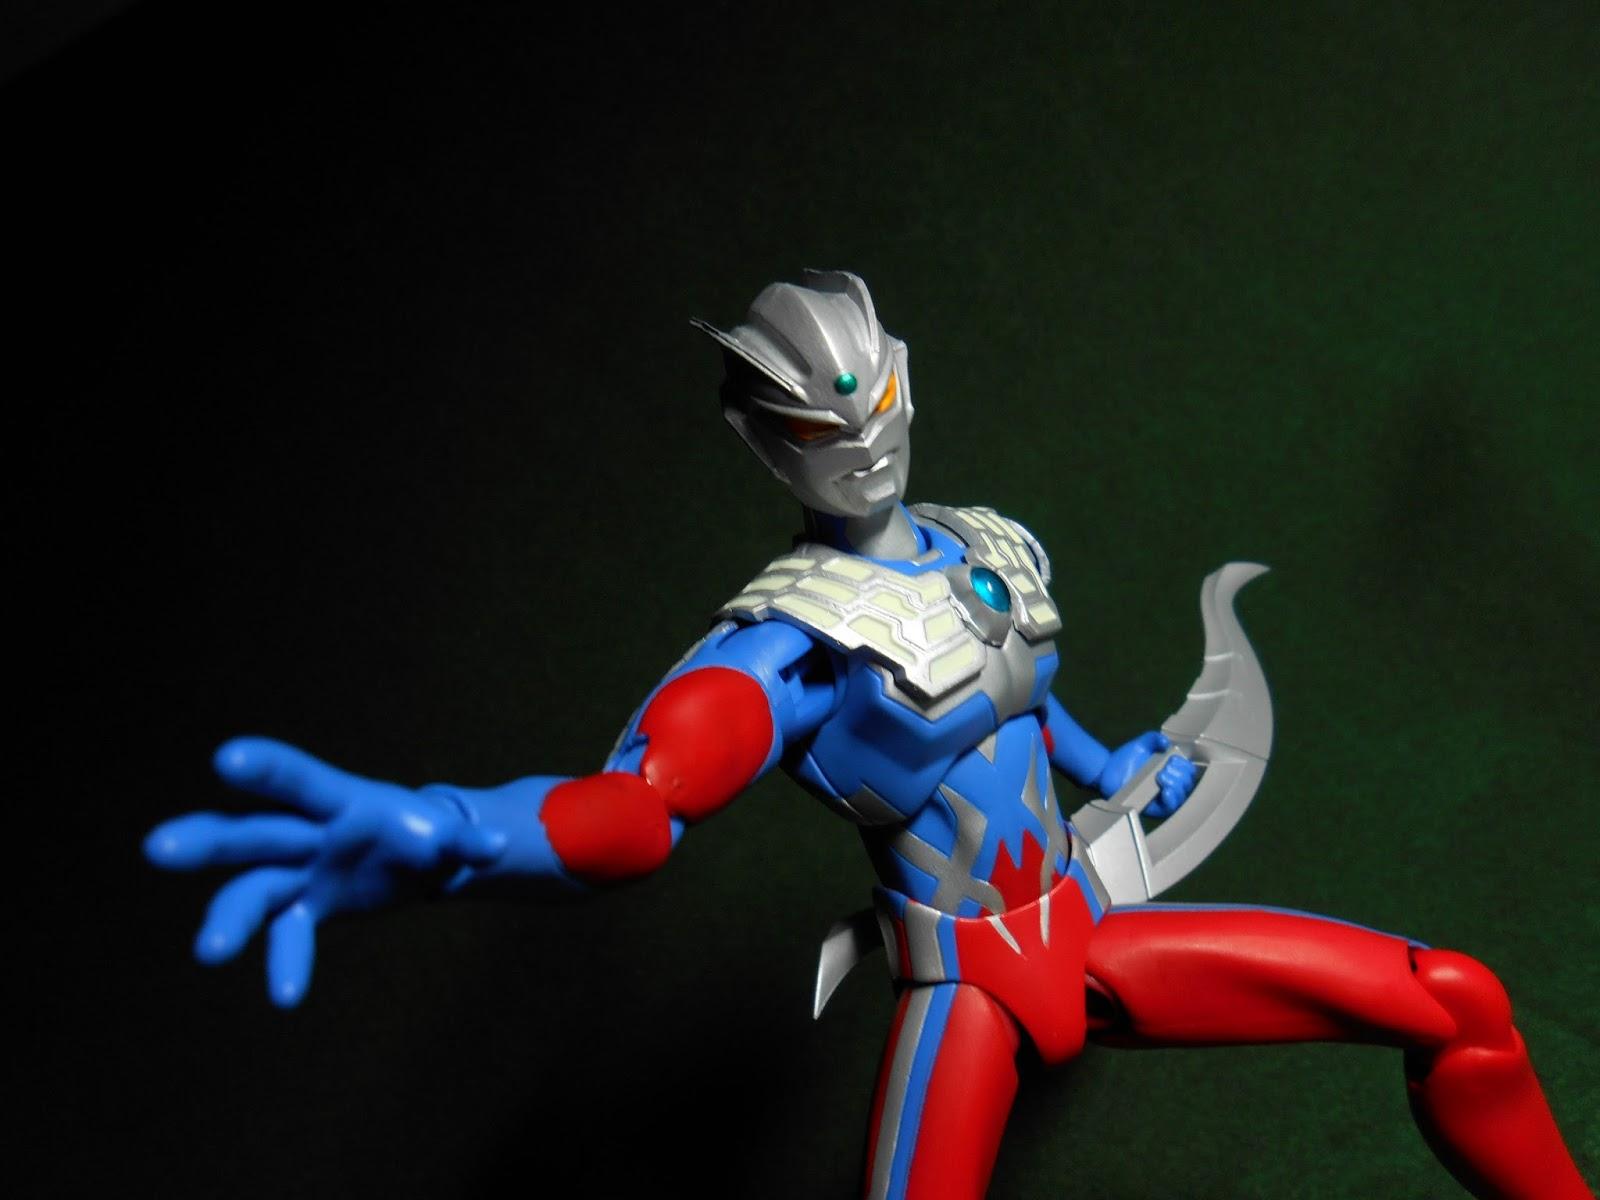 Pin Ultraman Zero Images to Pinterest